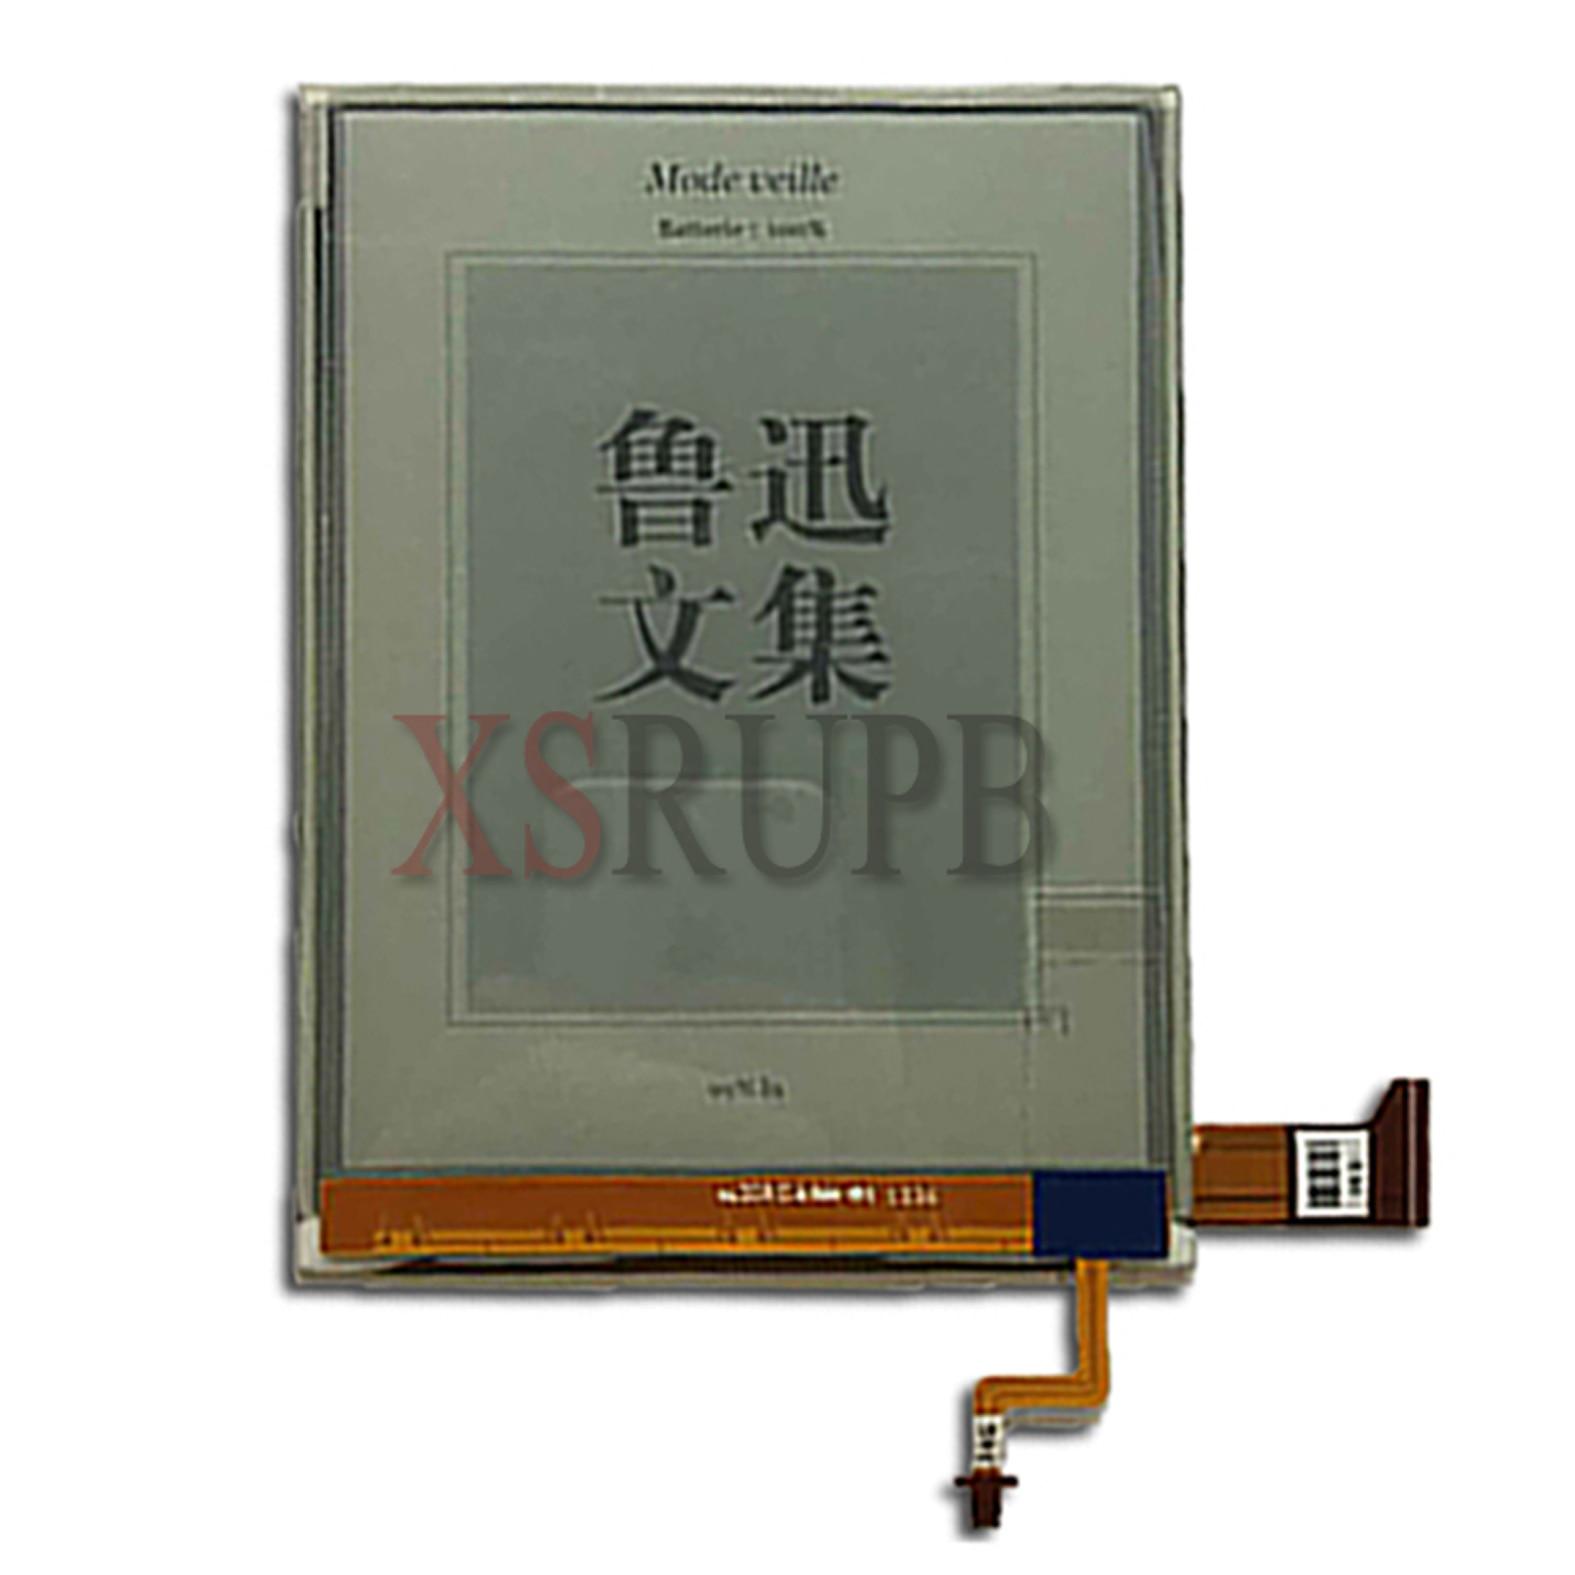 ed060xg3 matrix - 100% original 6-inch HD ED060XG3 ED060XG3(LF)T1-00 LCD for E-book readers LCD display(Not use pocketbook)